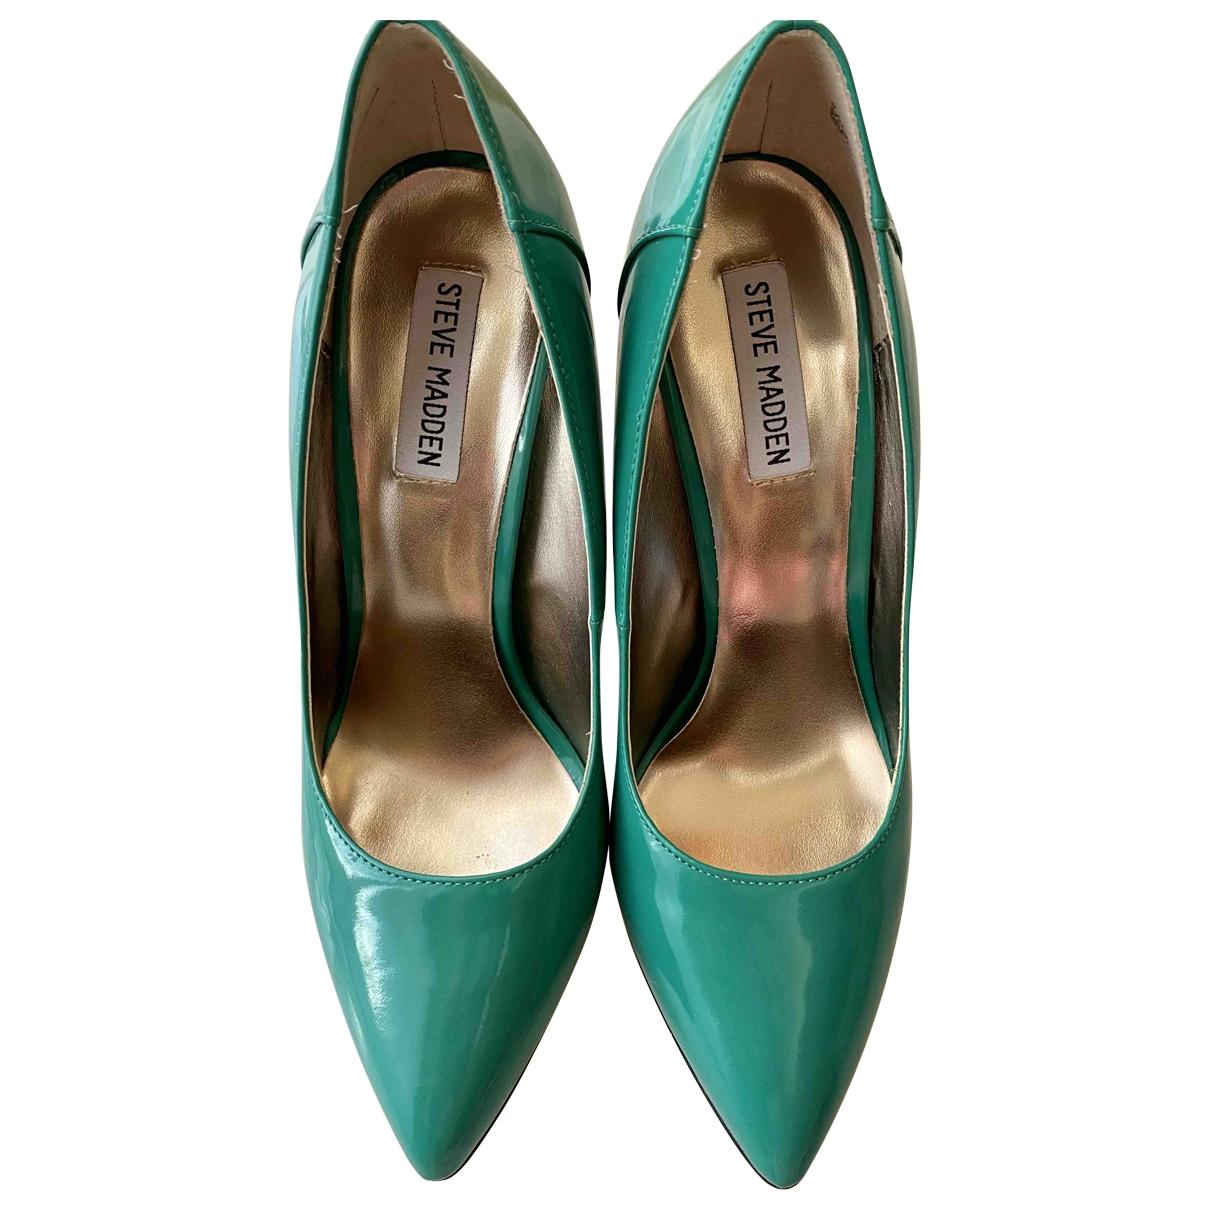 Steve Madden \N Green Patent leather Heels for Women 39 EU